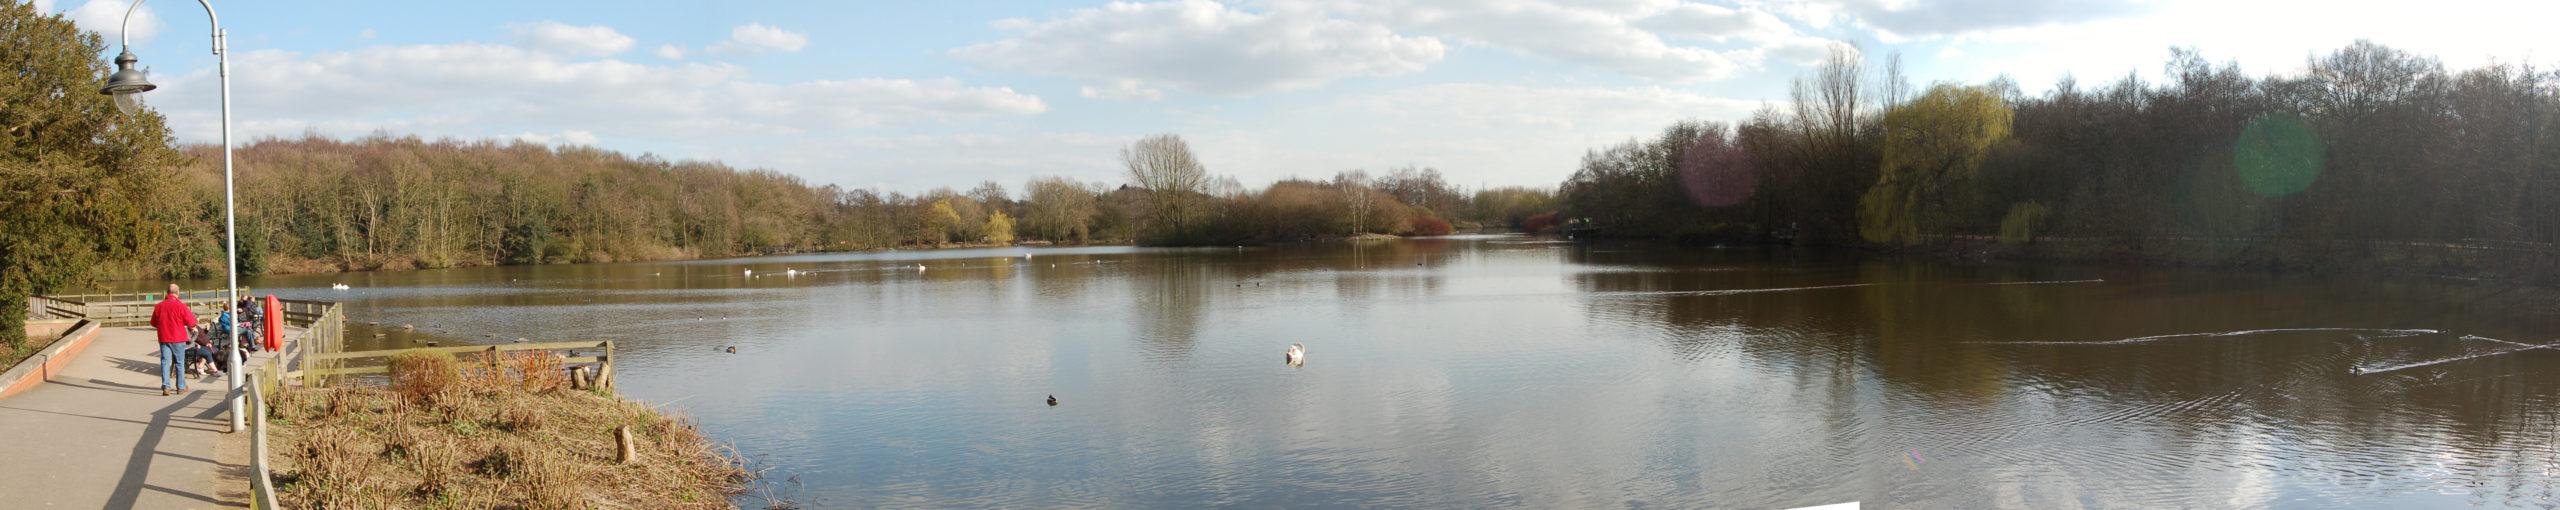 Rufford Abbey Lake